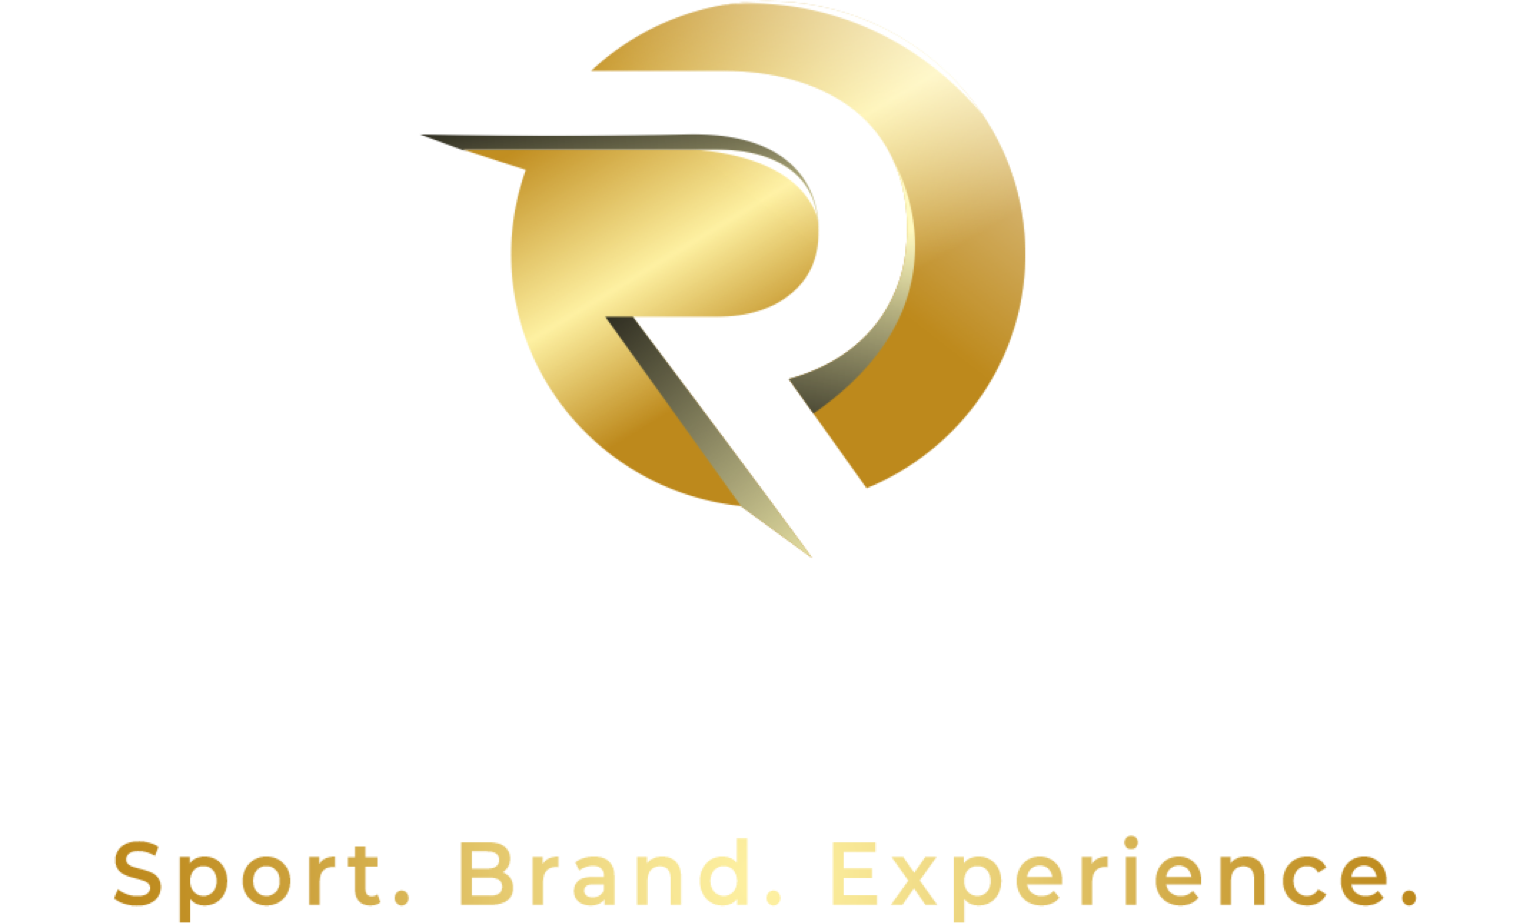 Rasoulution.com